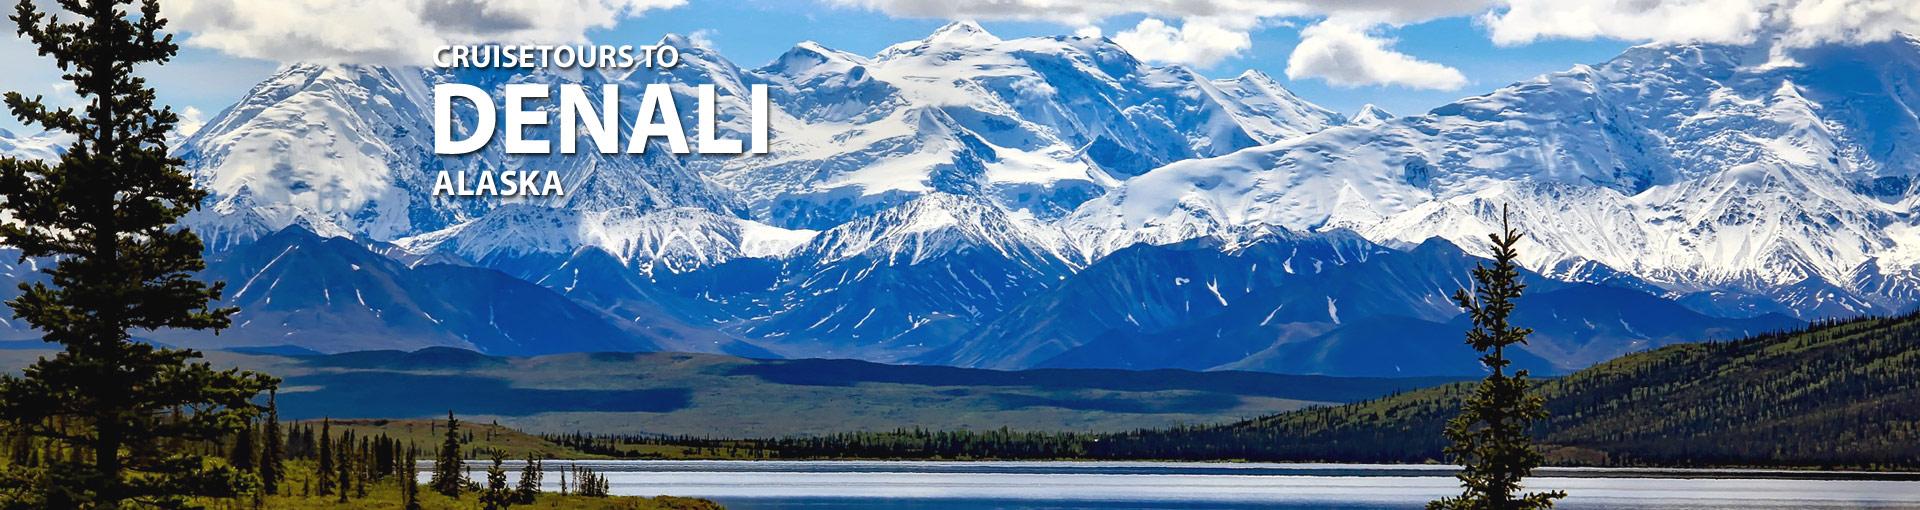 Cruisetours to Denali, Alaska